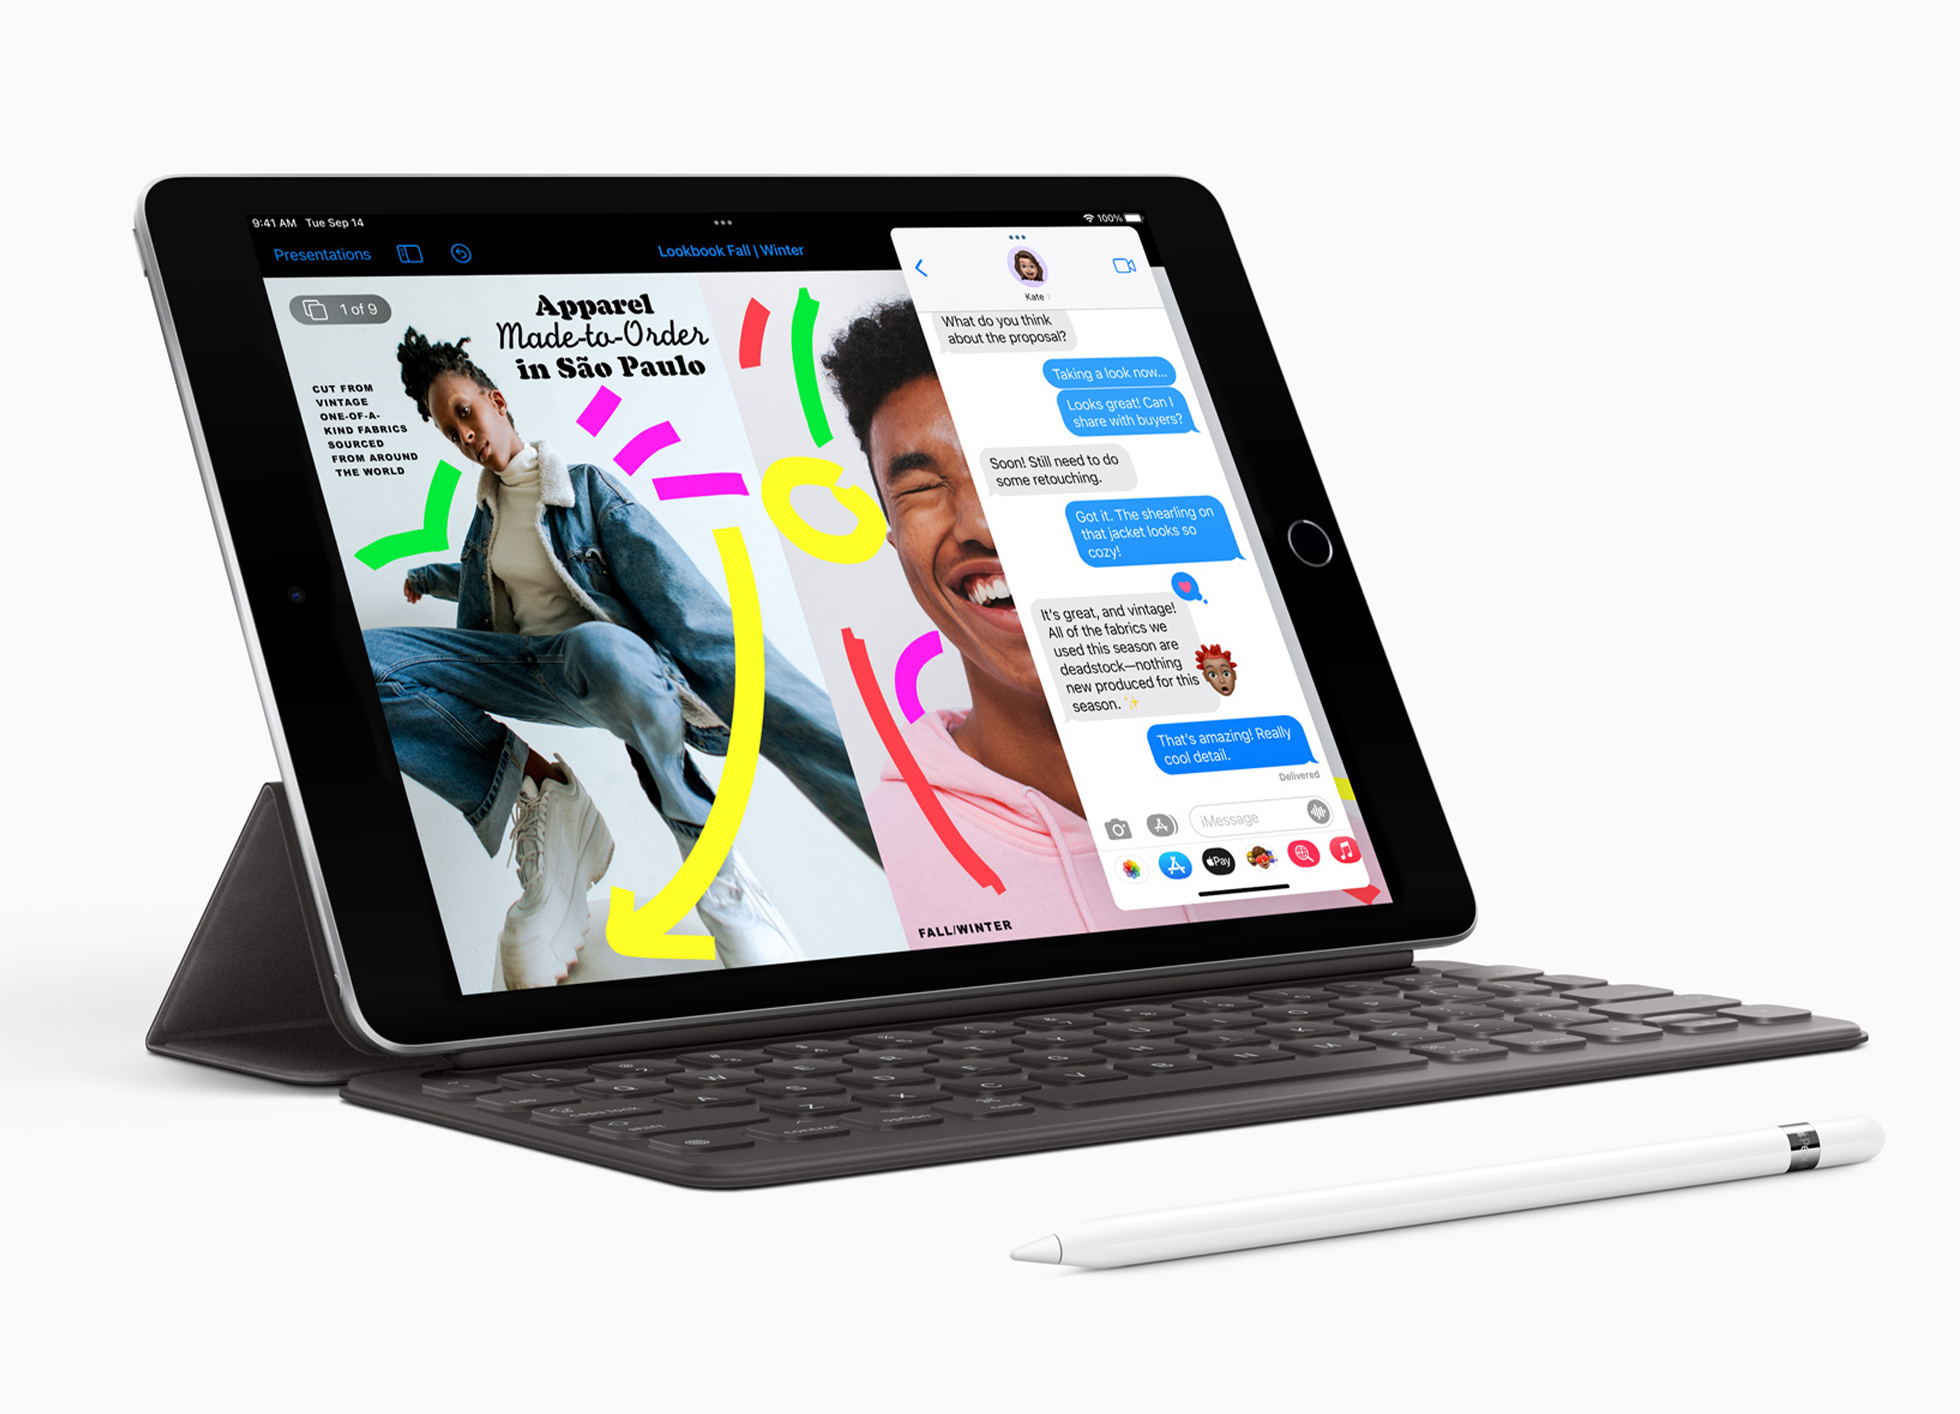 9th-generation iPad